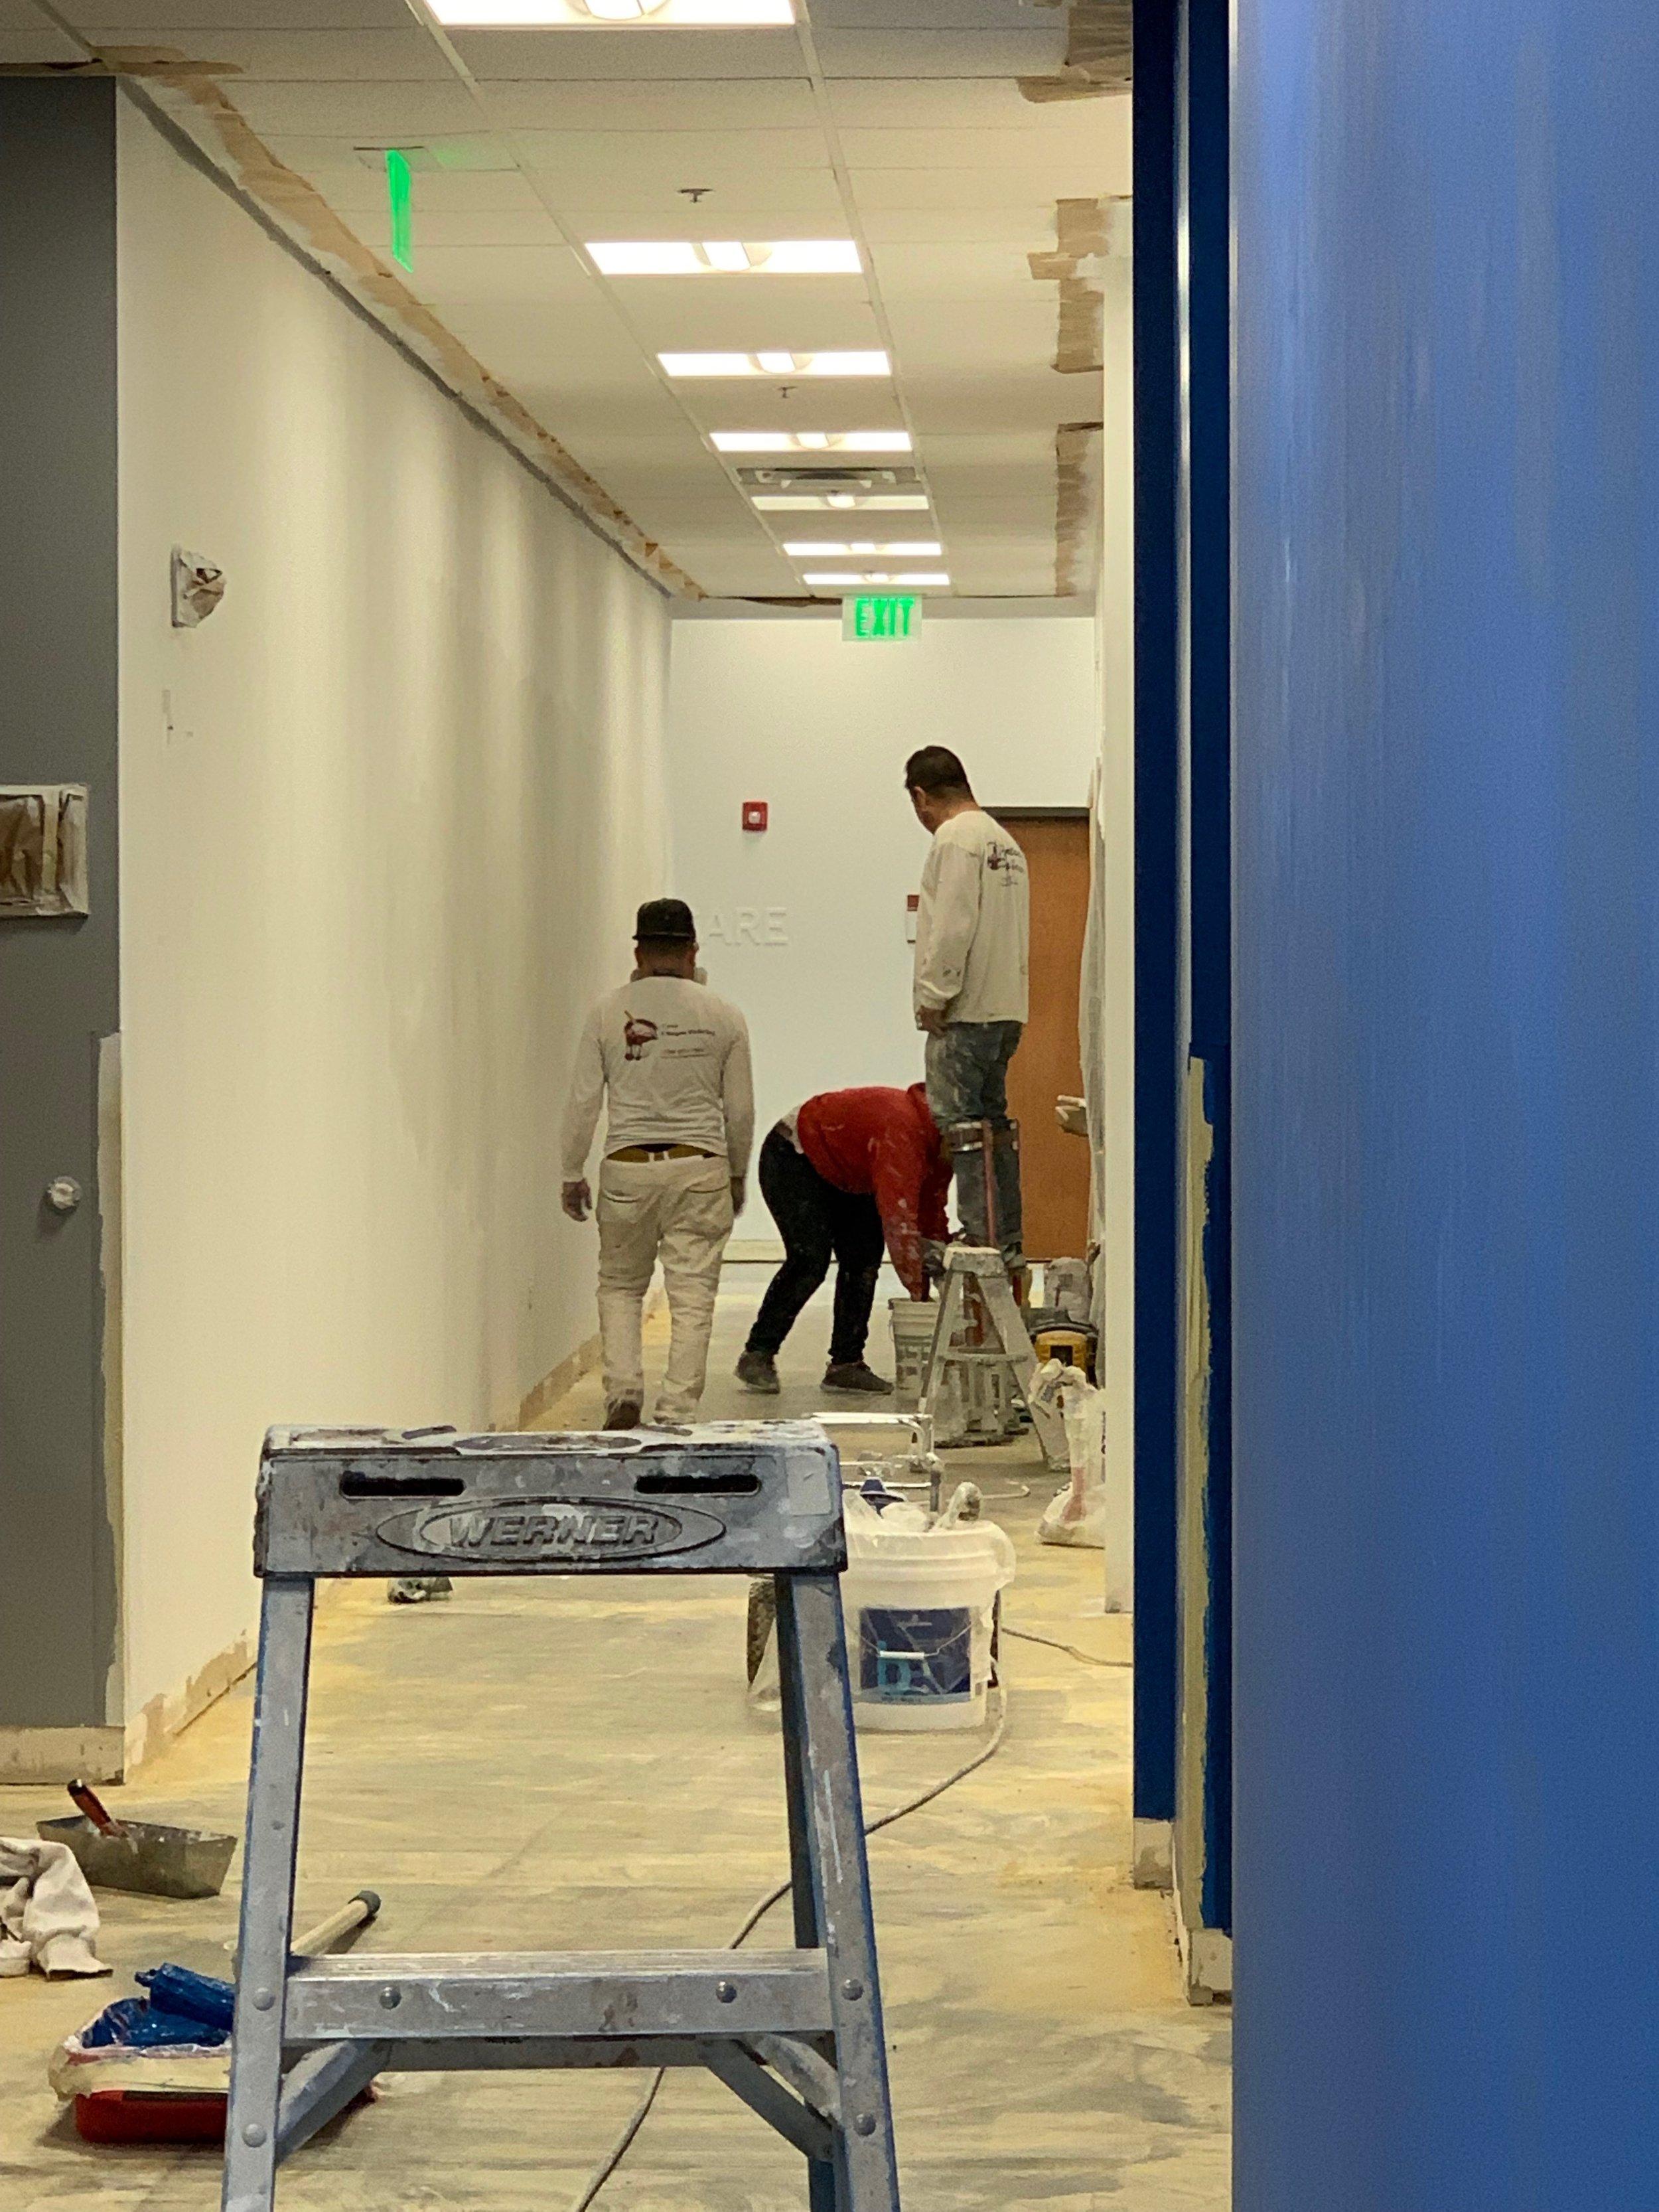 Medtronic prep hallway 4-27-19.JPG